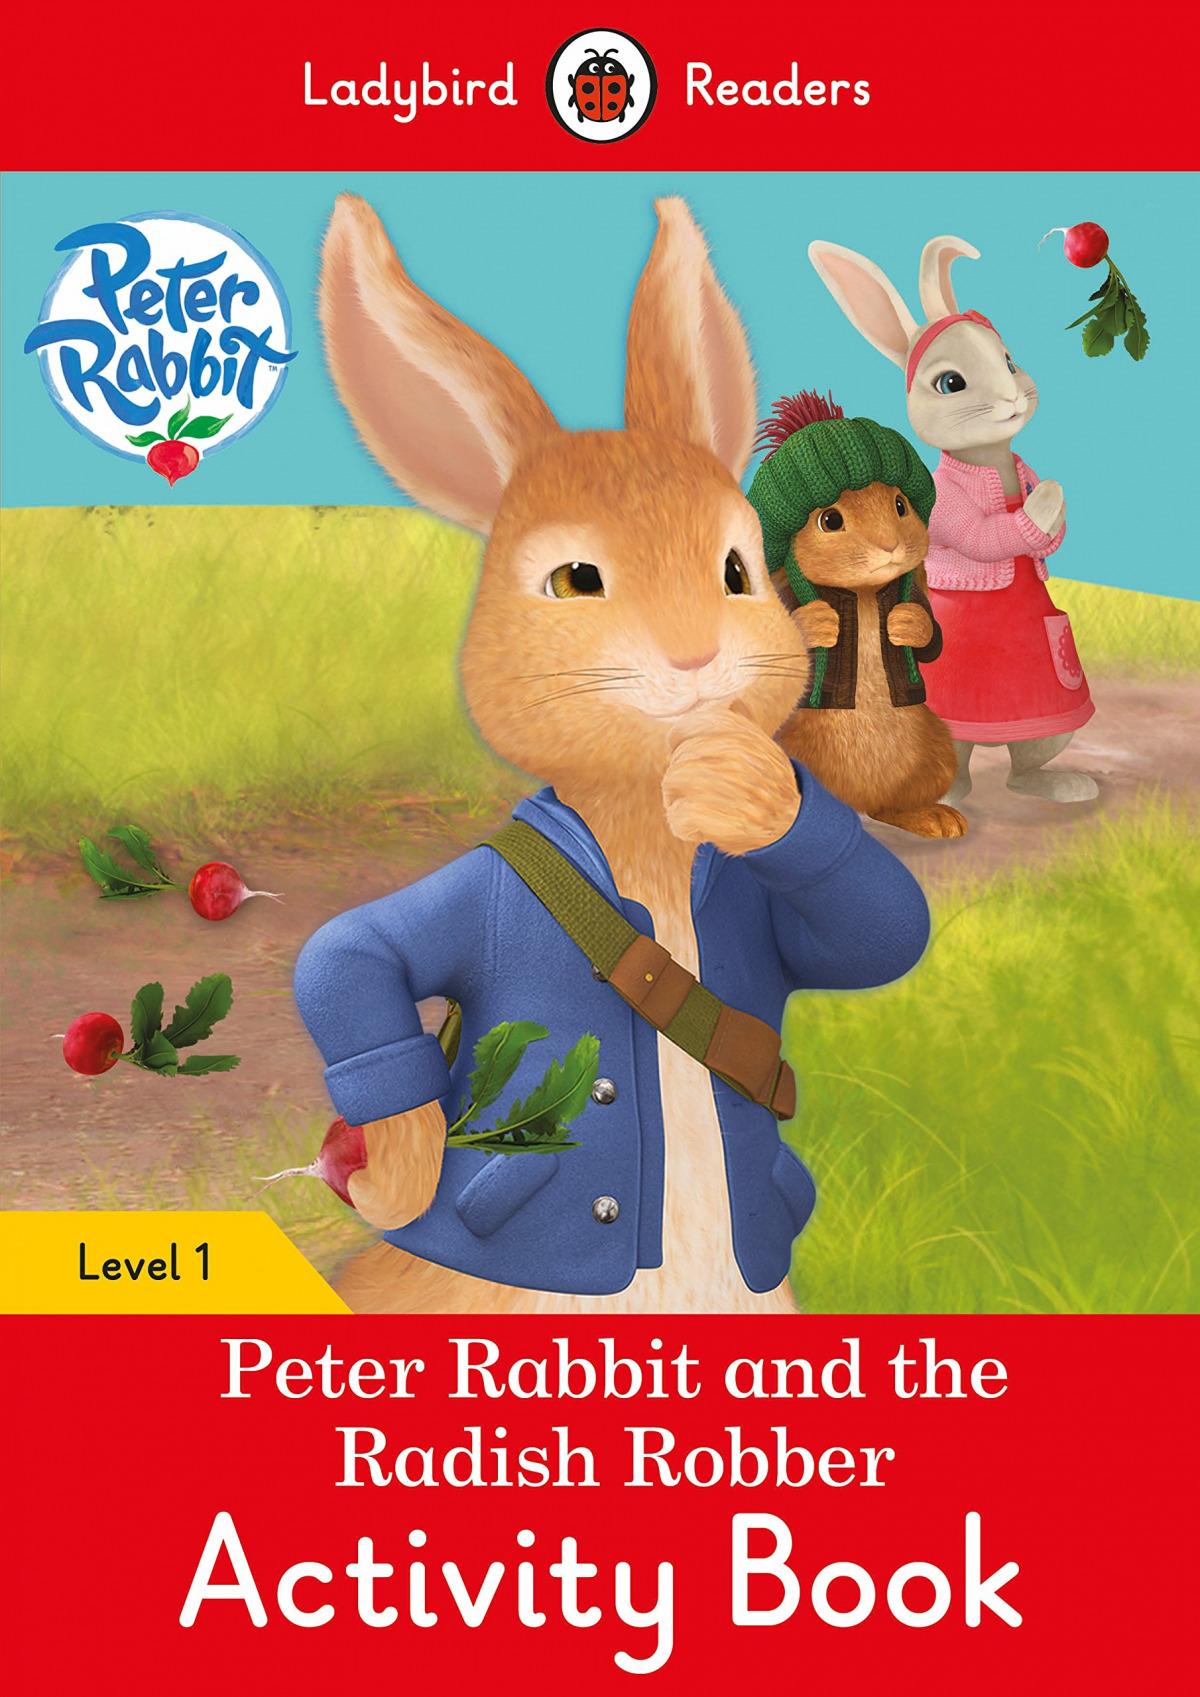 PETER RABBIT AND THE RADISH ROBBER. ACTIVIRT BOOK